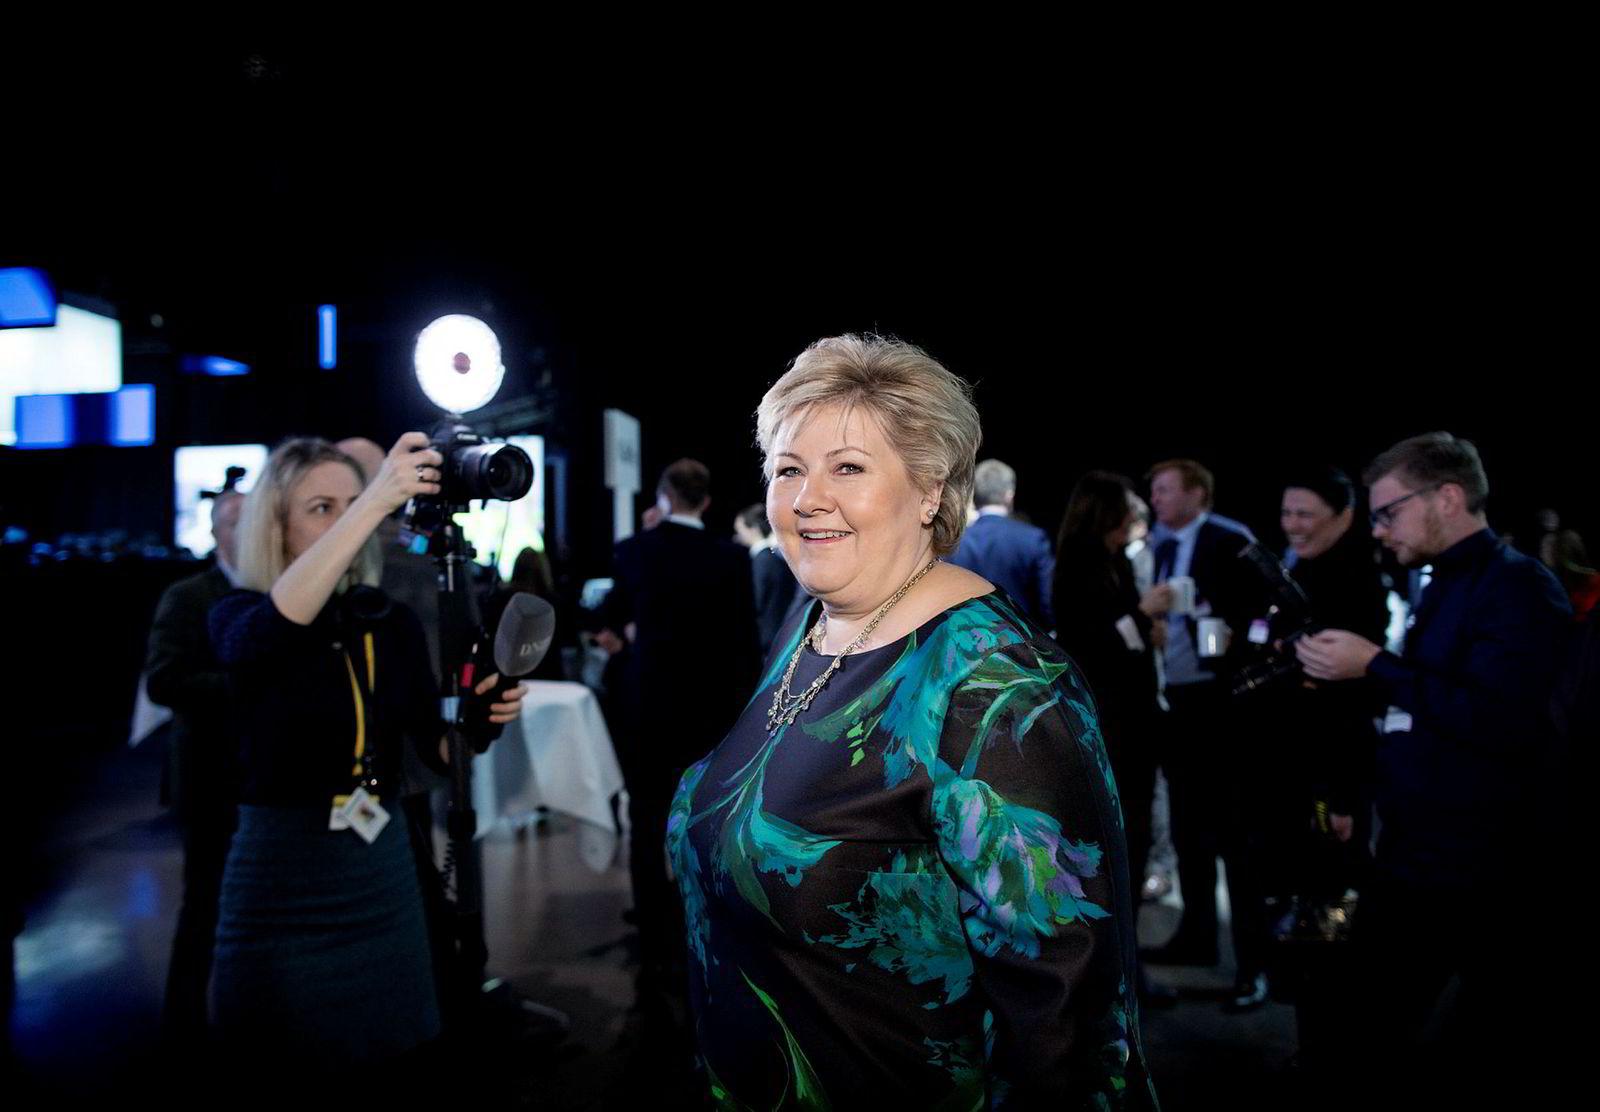 Statsminister Erna Solberg på vei inn til sceneområdet under NHOs årskonferanse i Oslo Spektrum tirsdag.